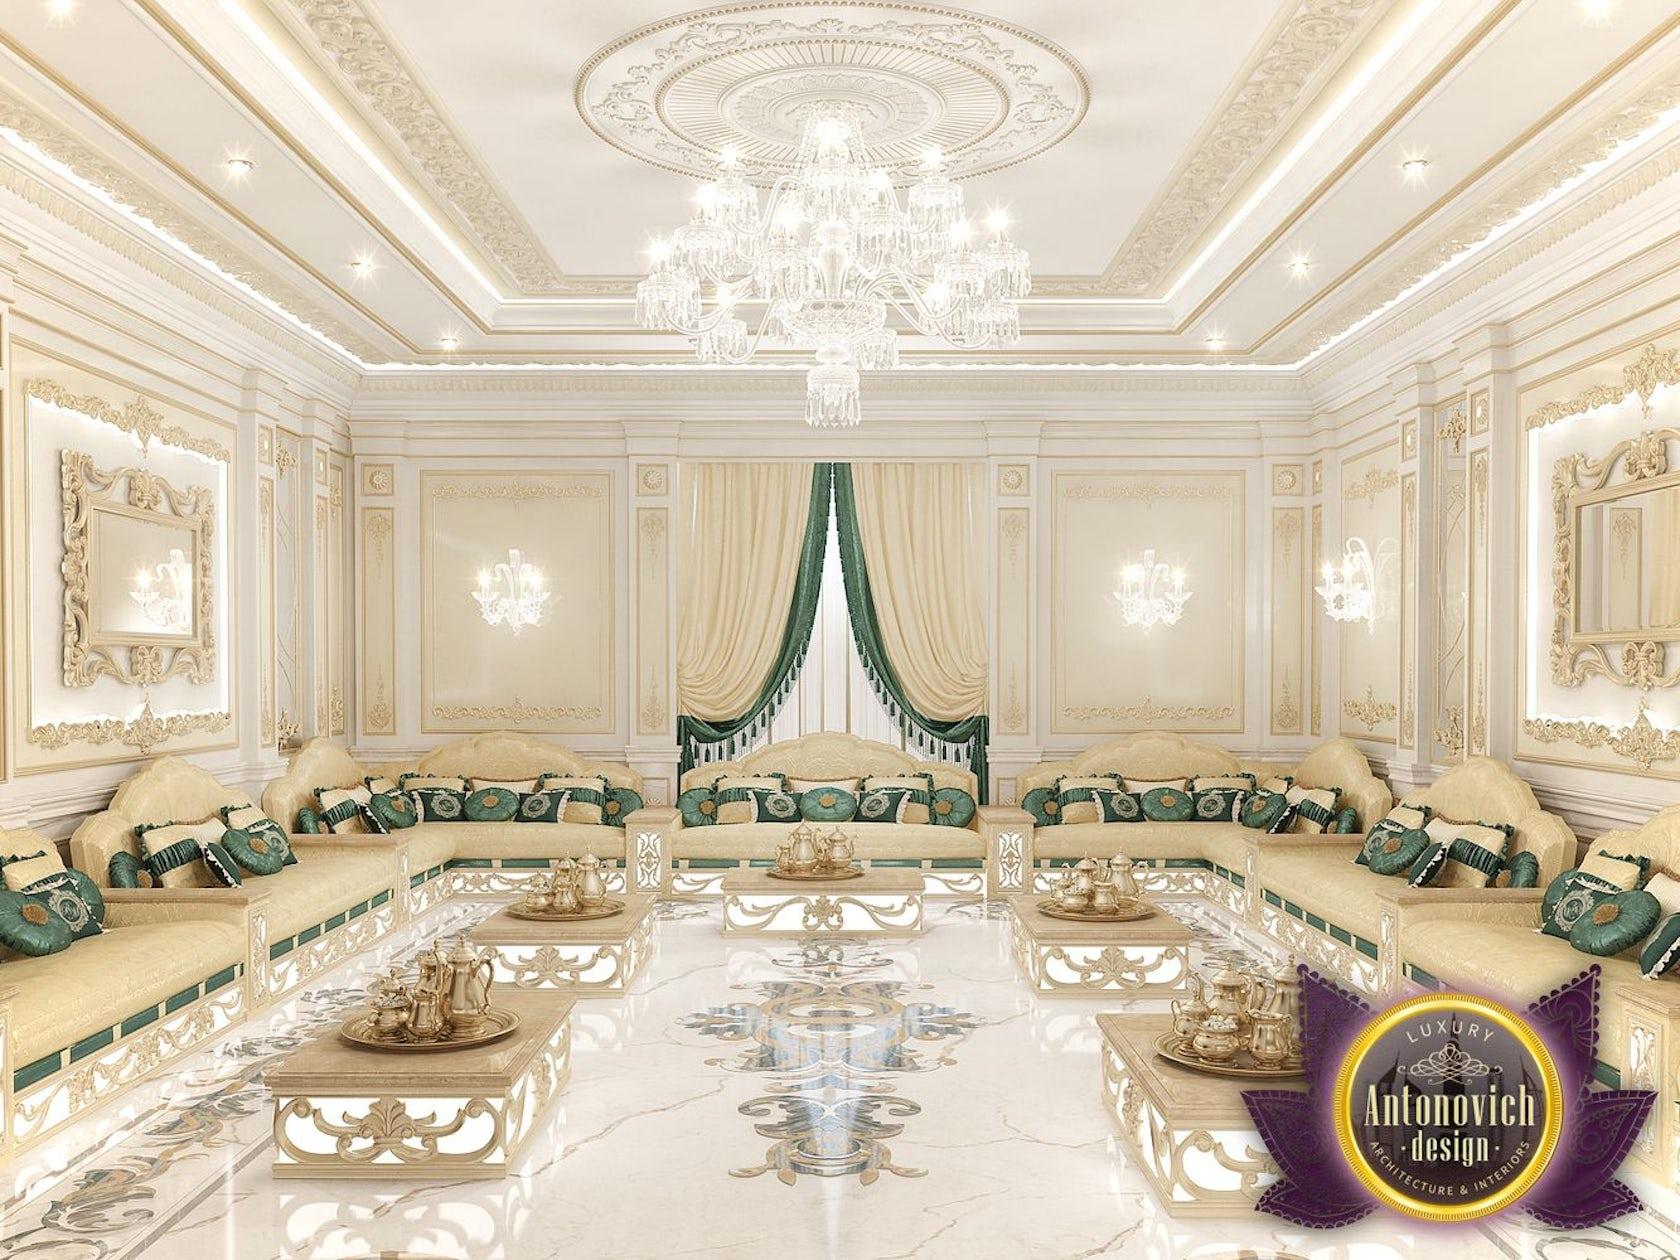 Arabic Majlis Interior Design From Luxury Antonovich